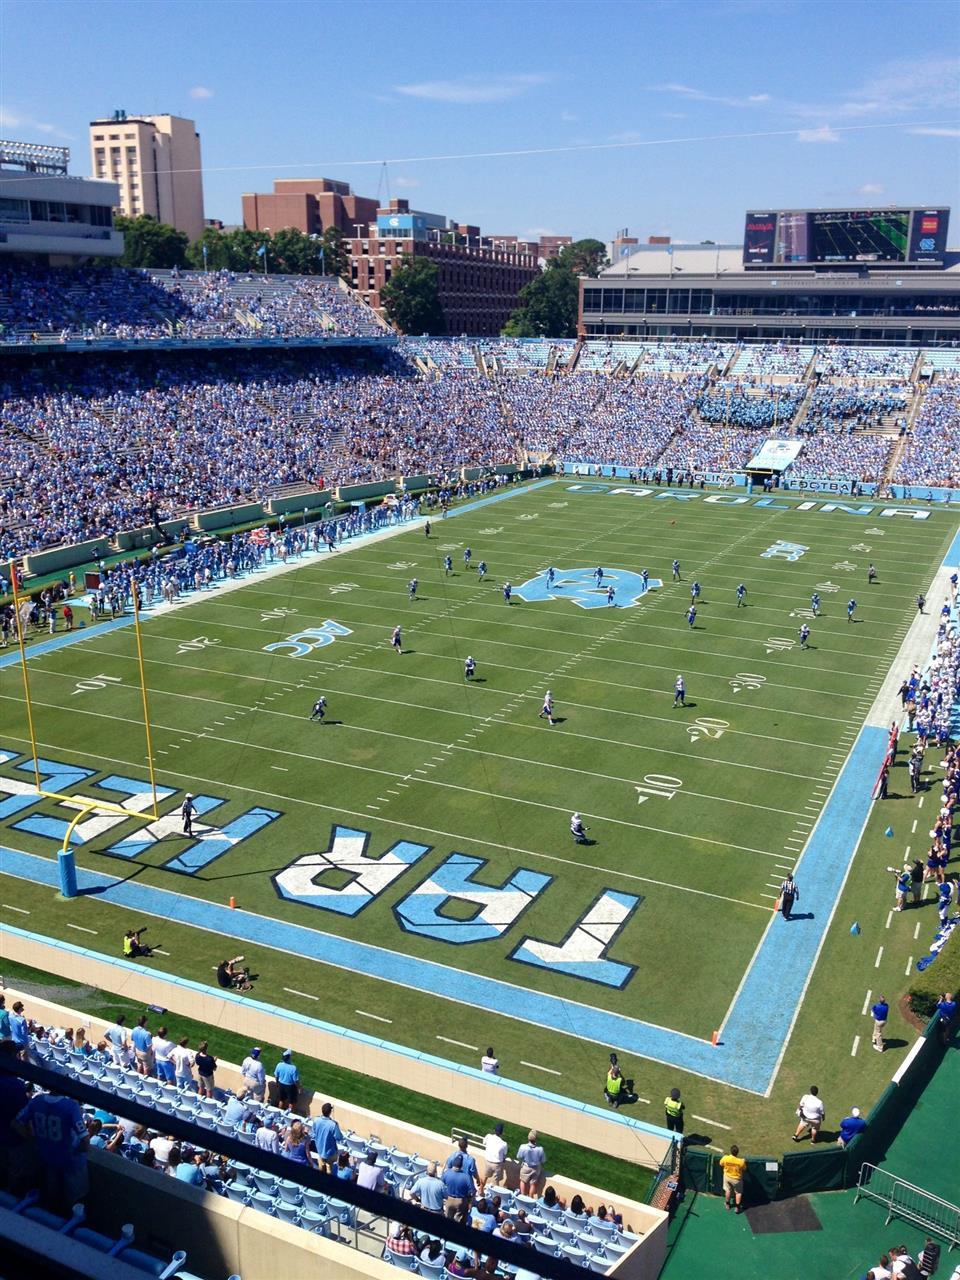 Fall football season starts in Kenan Stadium, University of NC-Chapel Hill